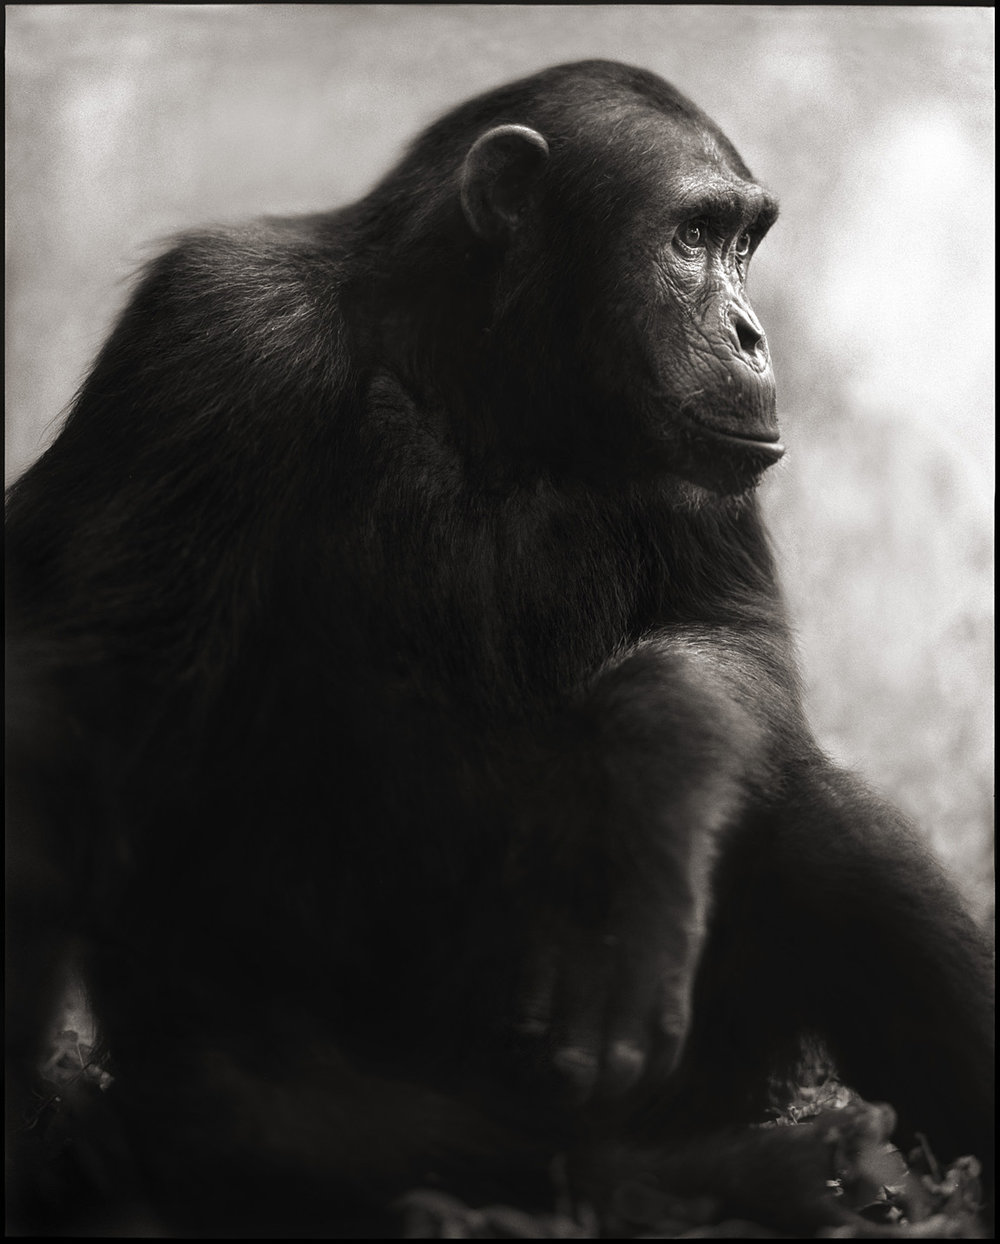 Chimpanzee Posing